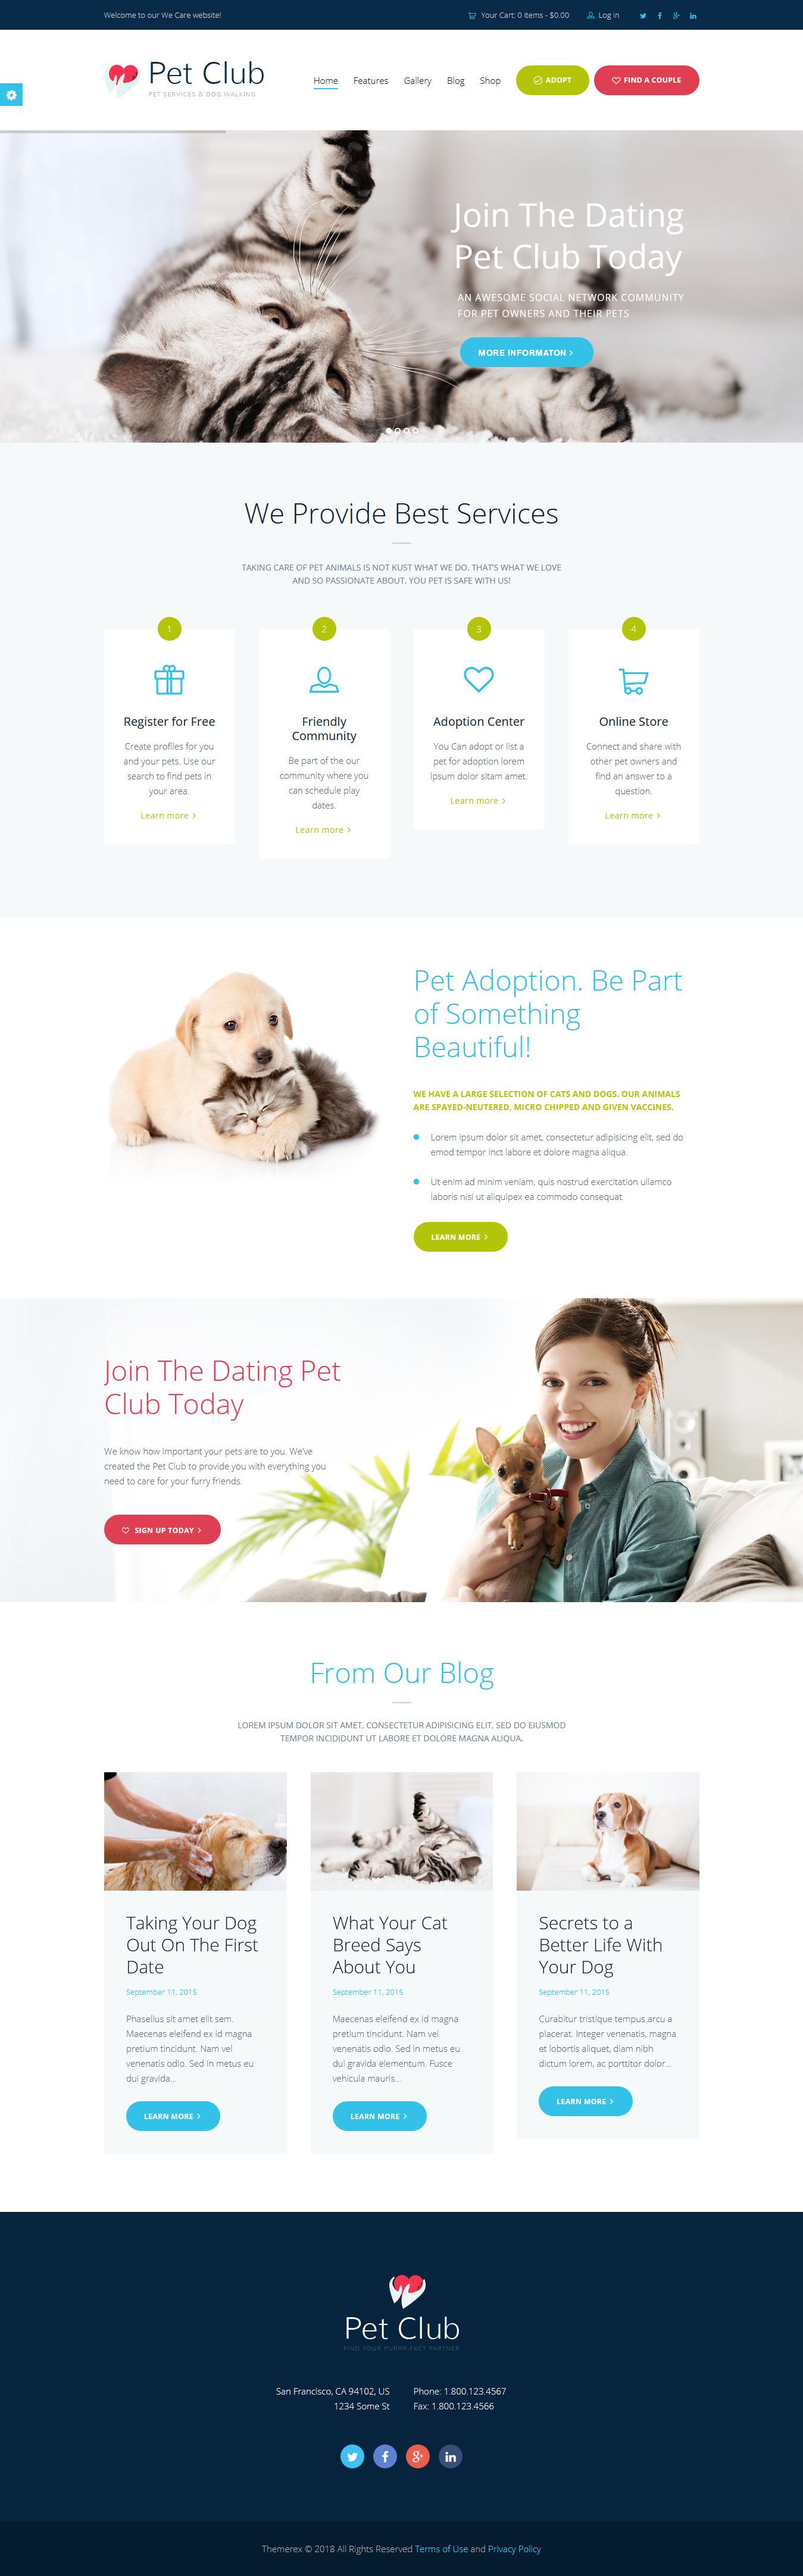 pet club best premium animal and pet wordpress theme - 10+ Best Premium Animal and Pet WordPress Themes